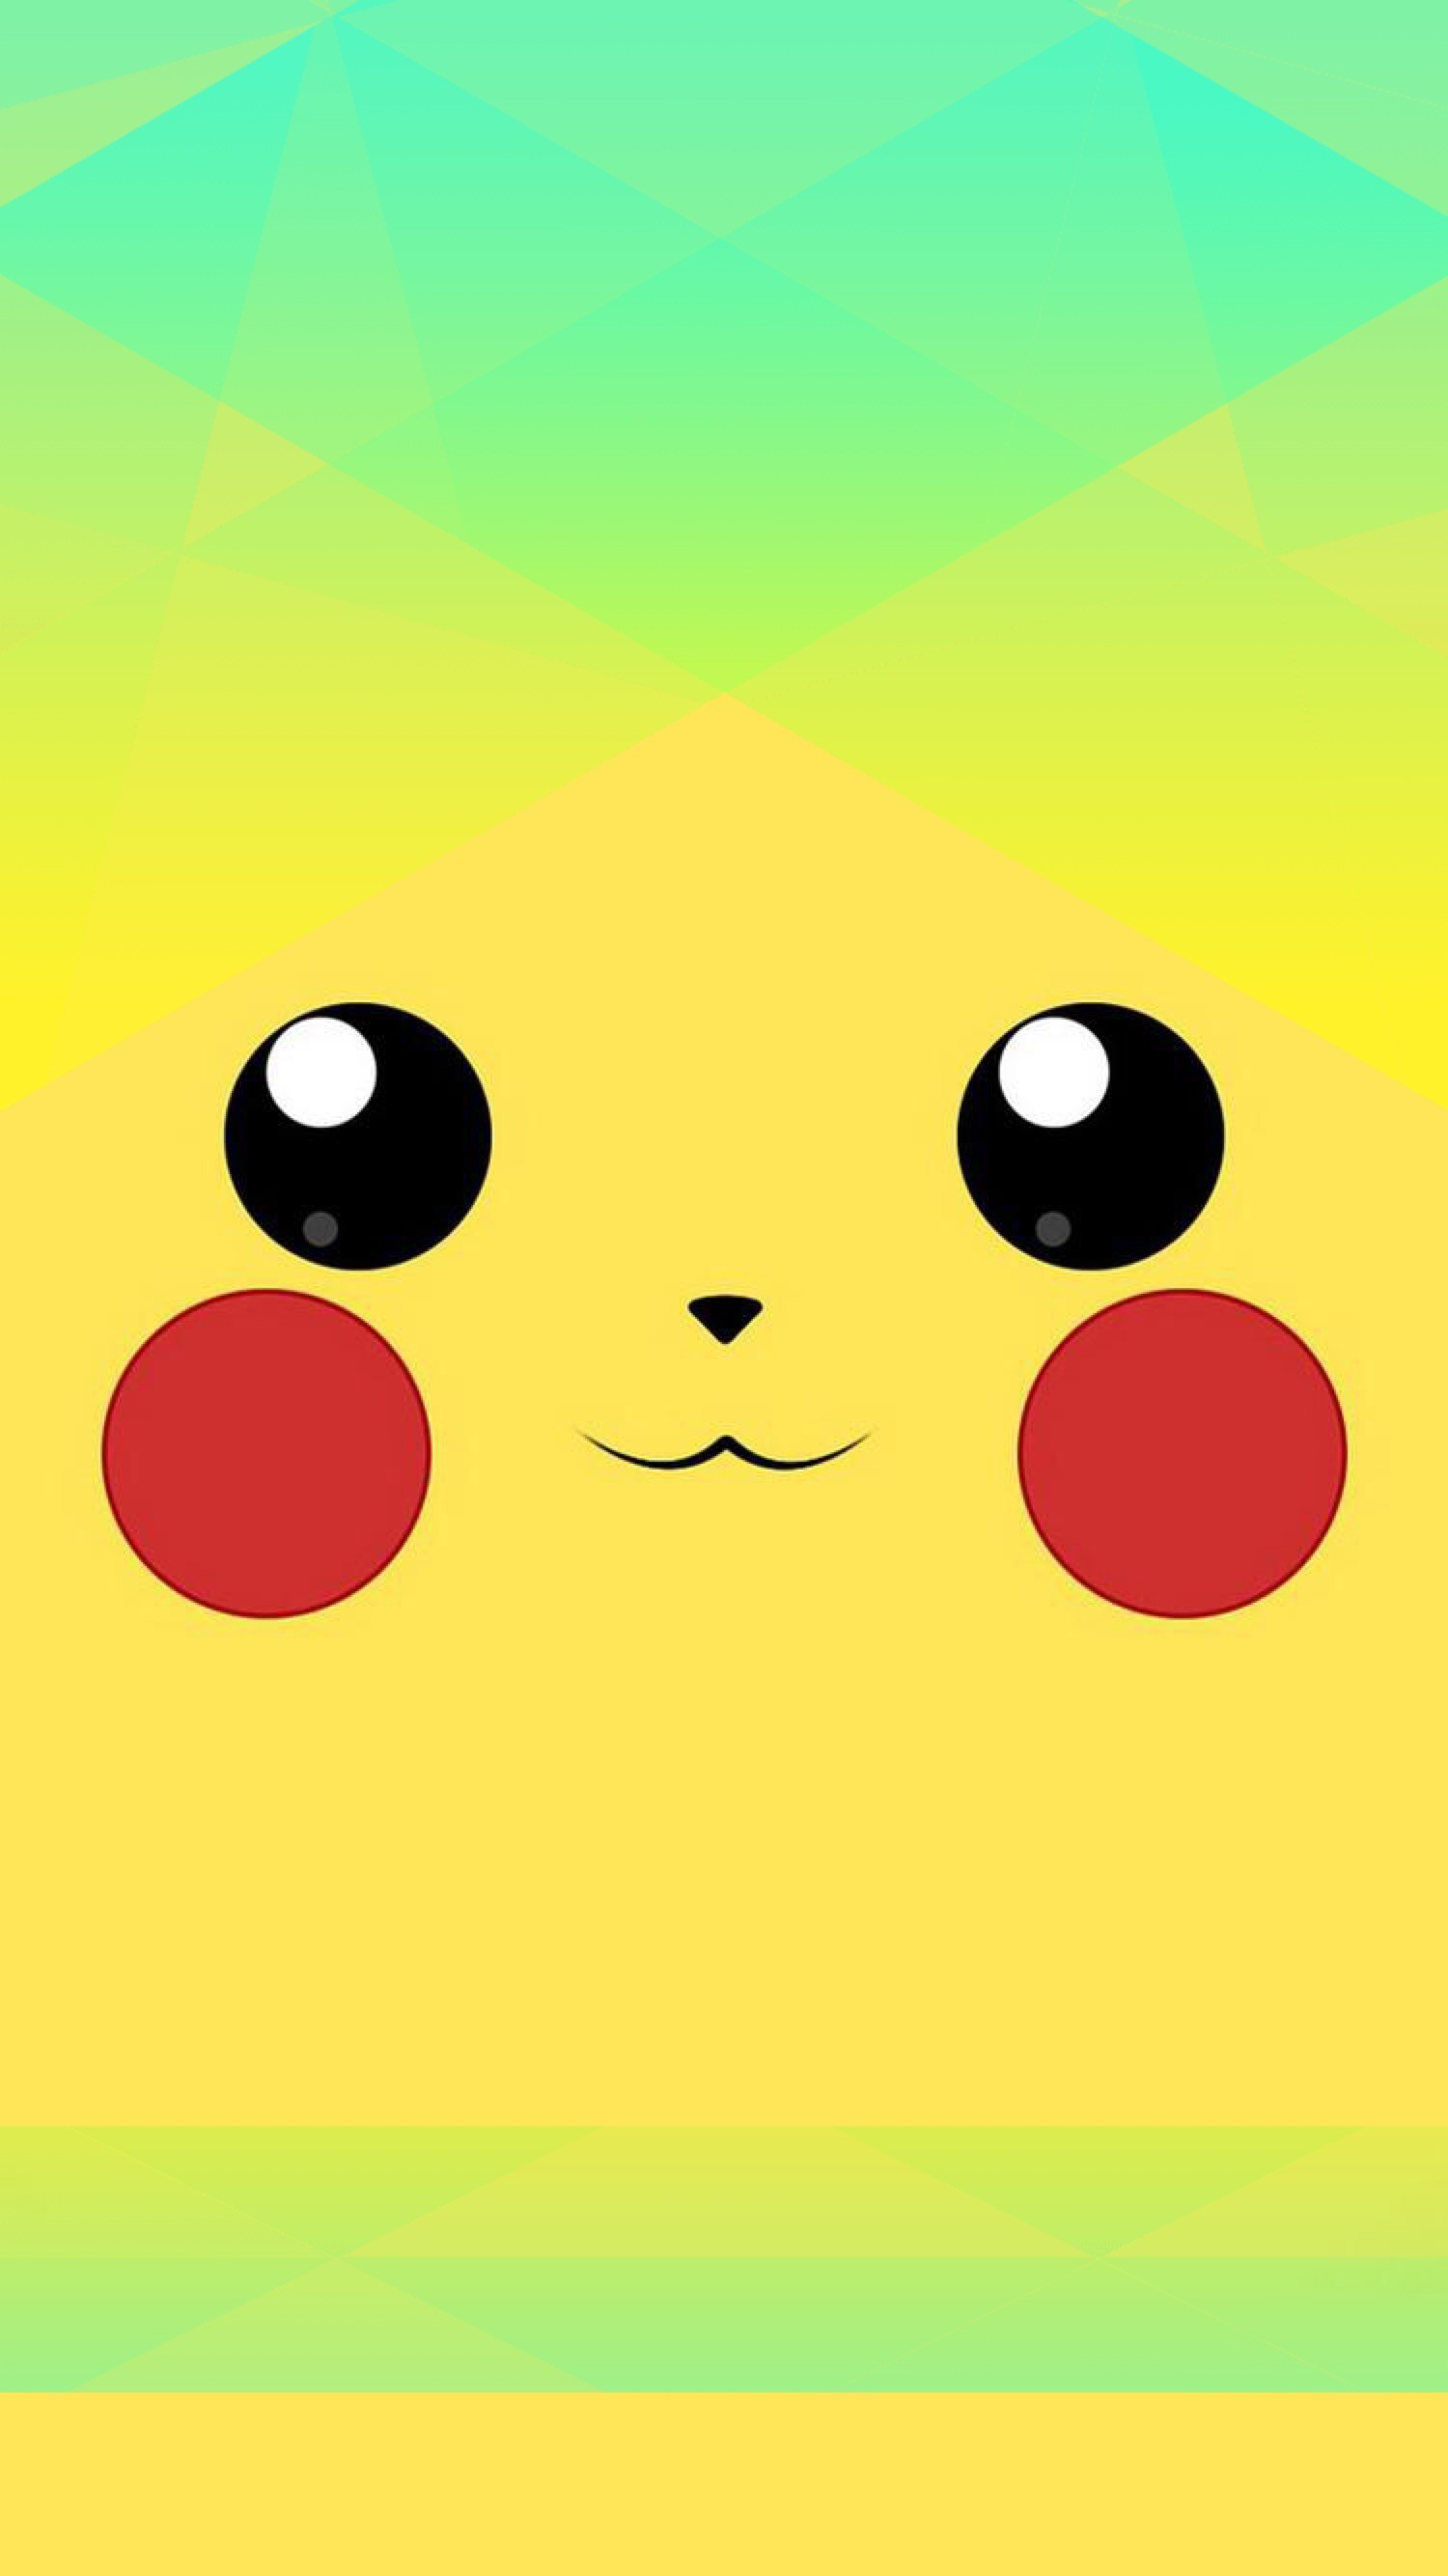 Lockscreens Art Creative Pokemon Pikachu Fun Yellow. Lock Screen Wallpaper PikachuPokemonPhone …